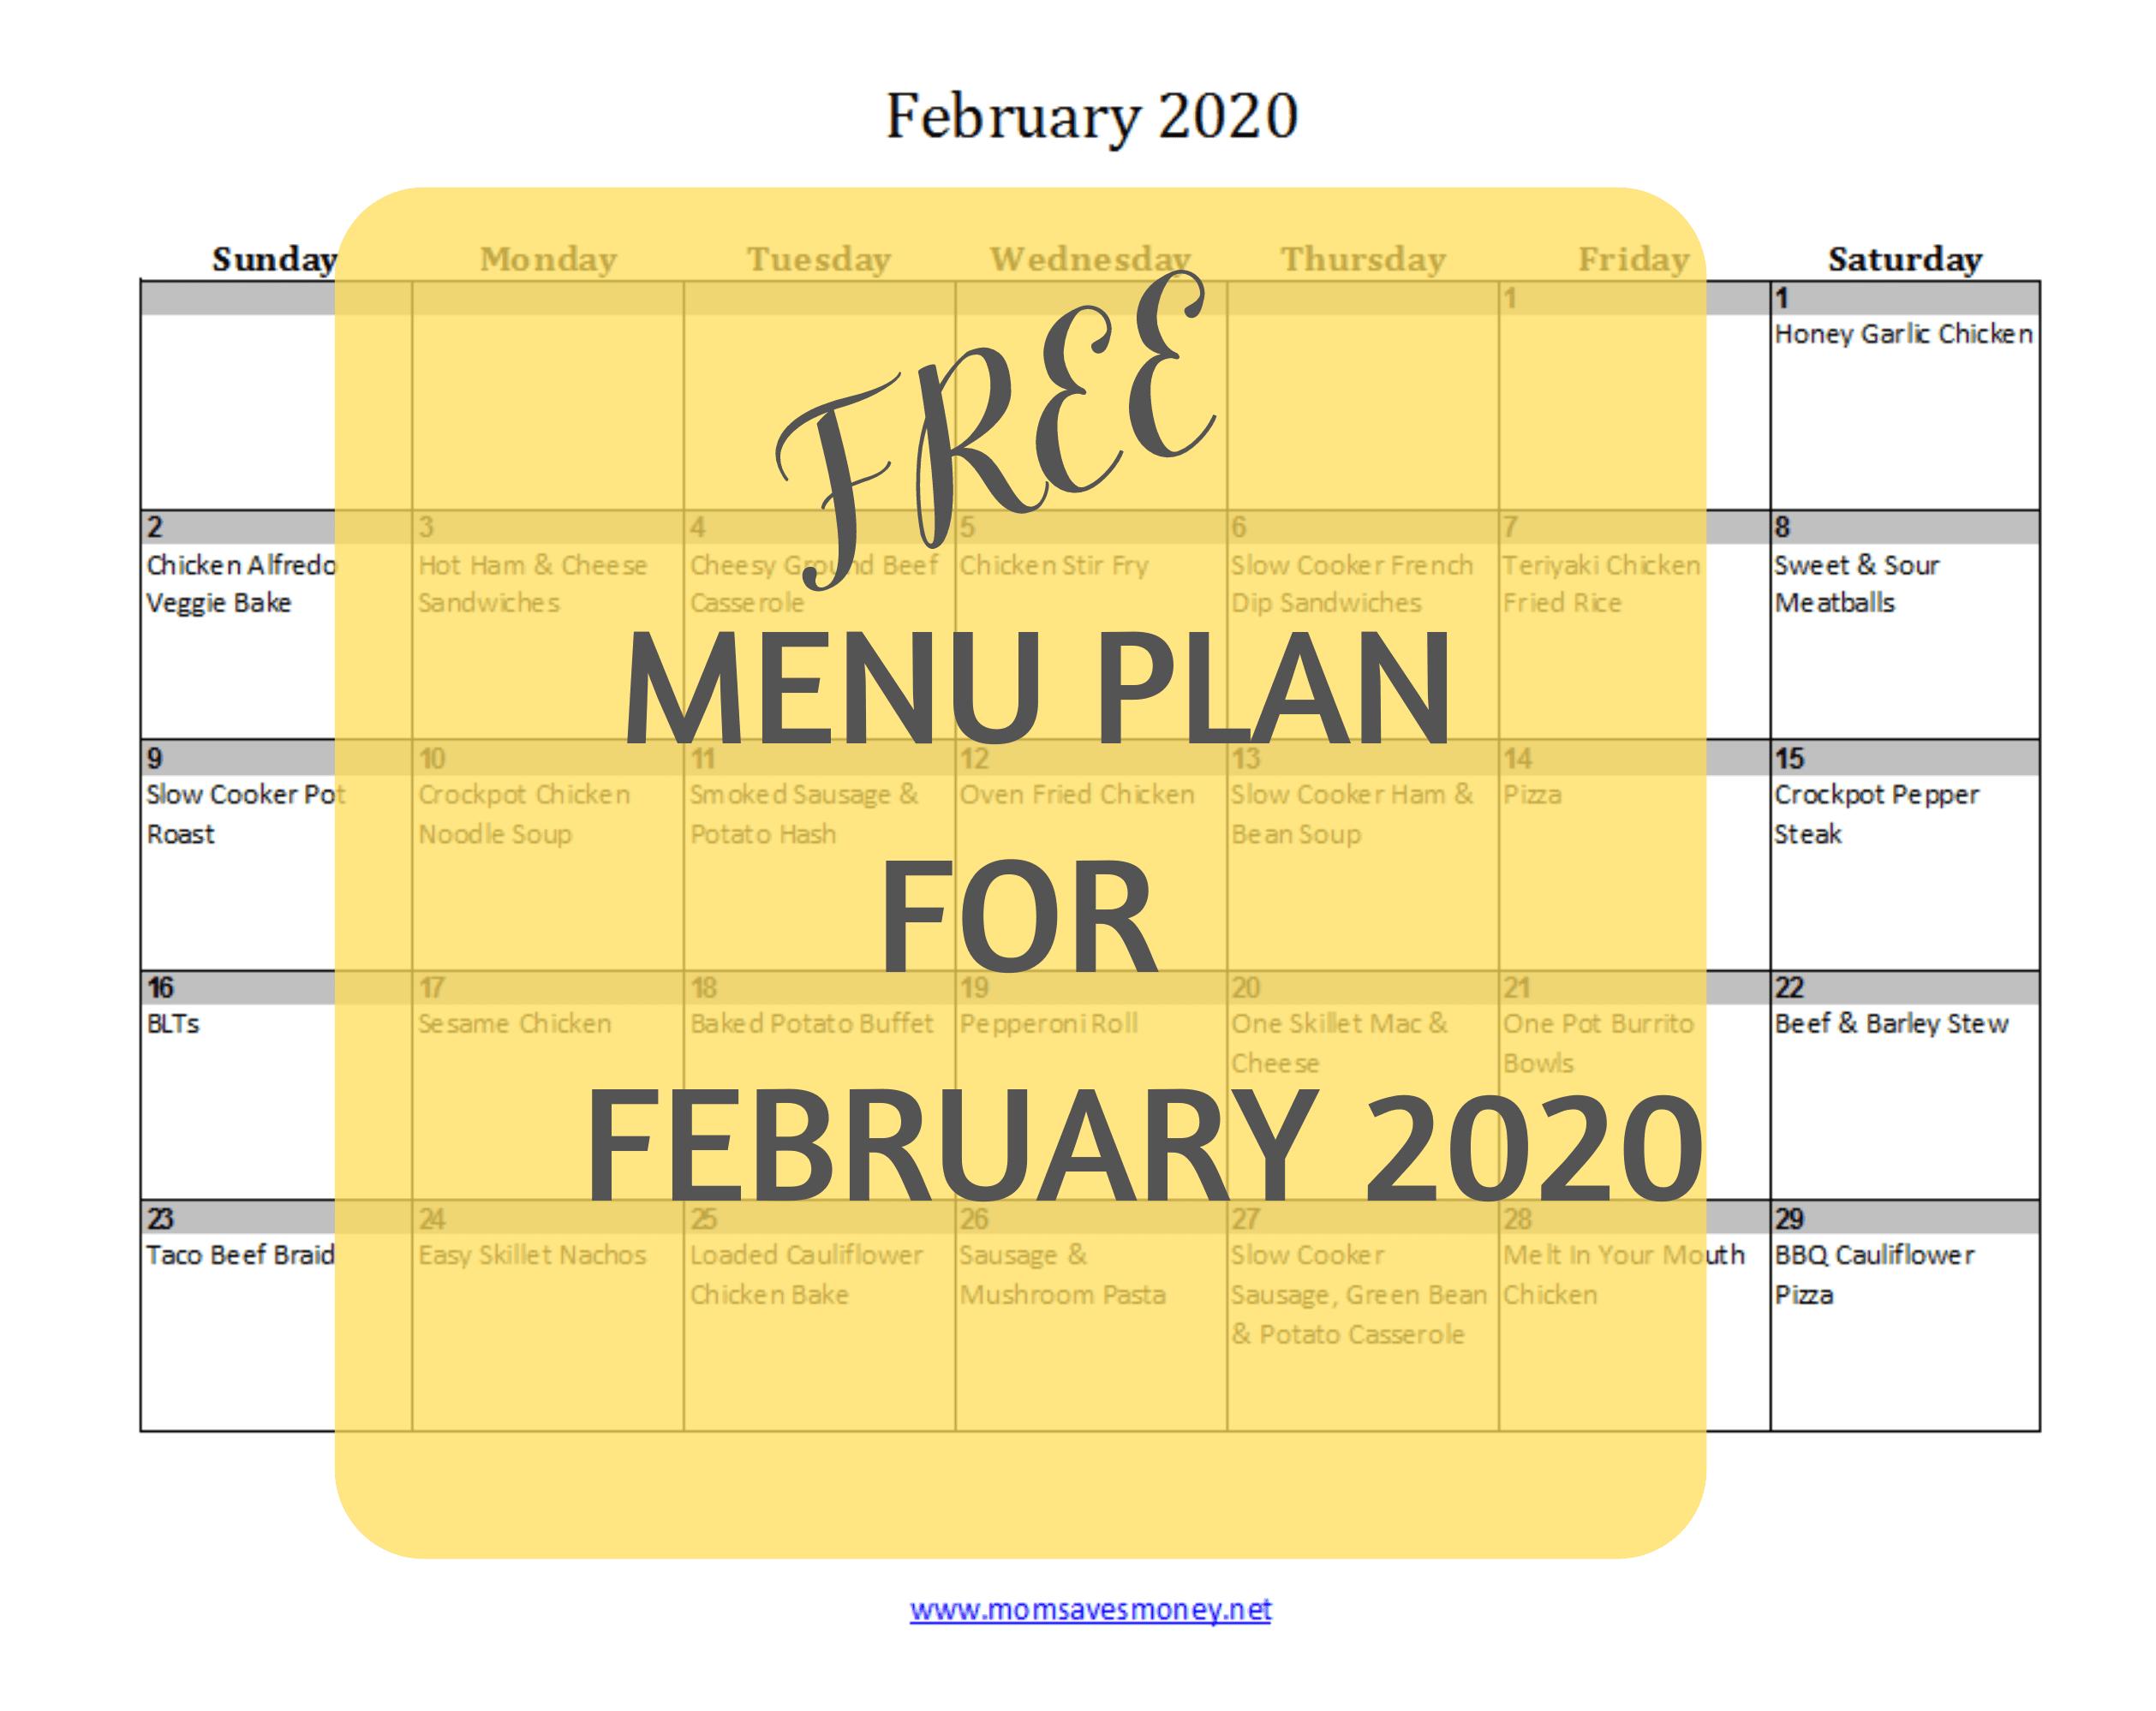 free menu plan for February 2020